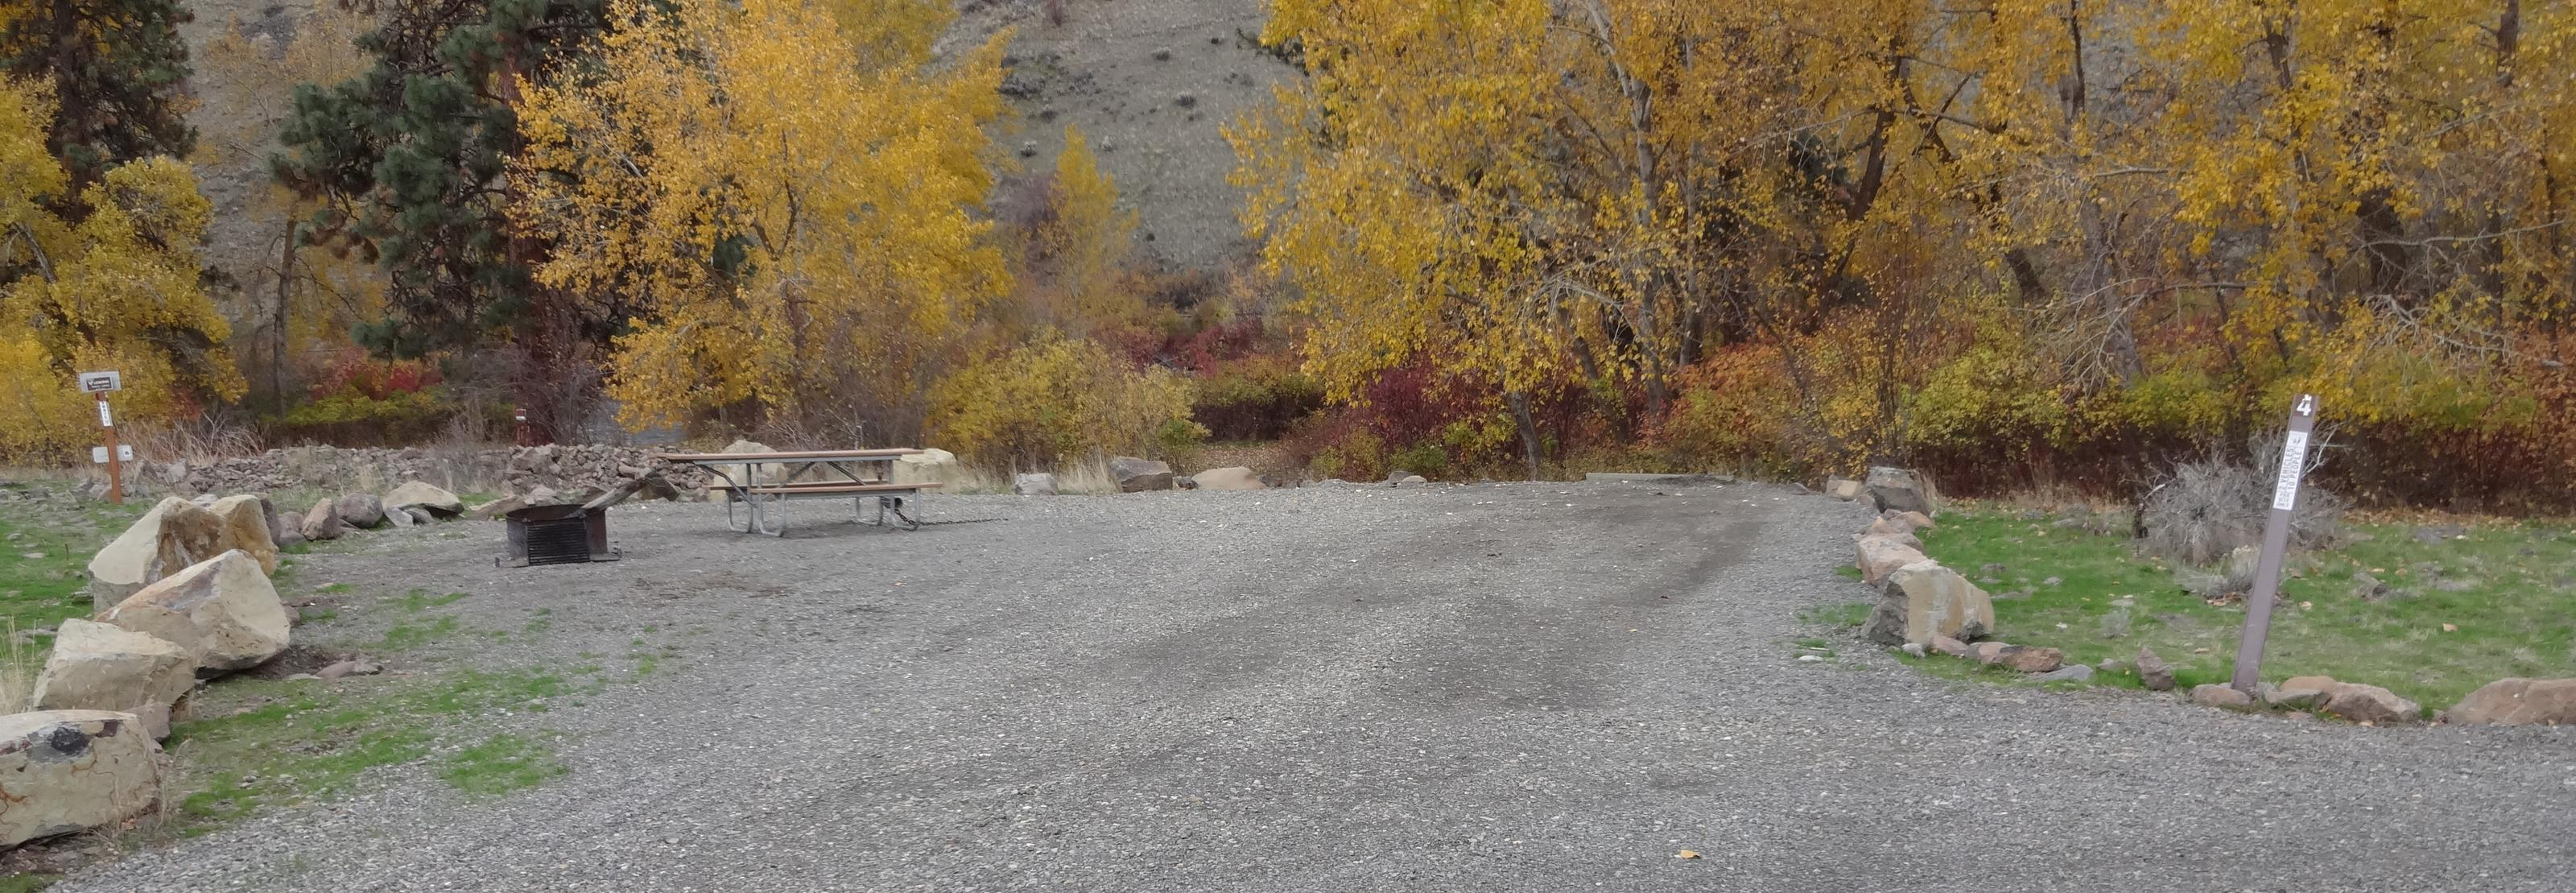 Parking spot, picnic table and fire ring at Umtanum Campsite #4Umtanum campsite #4